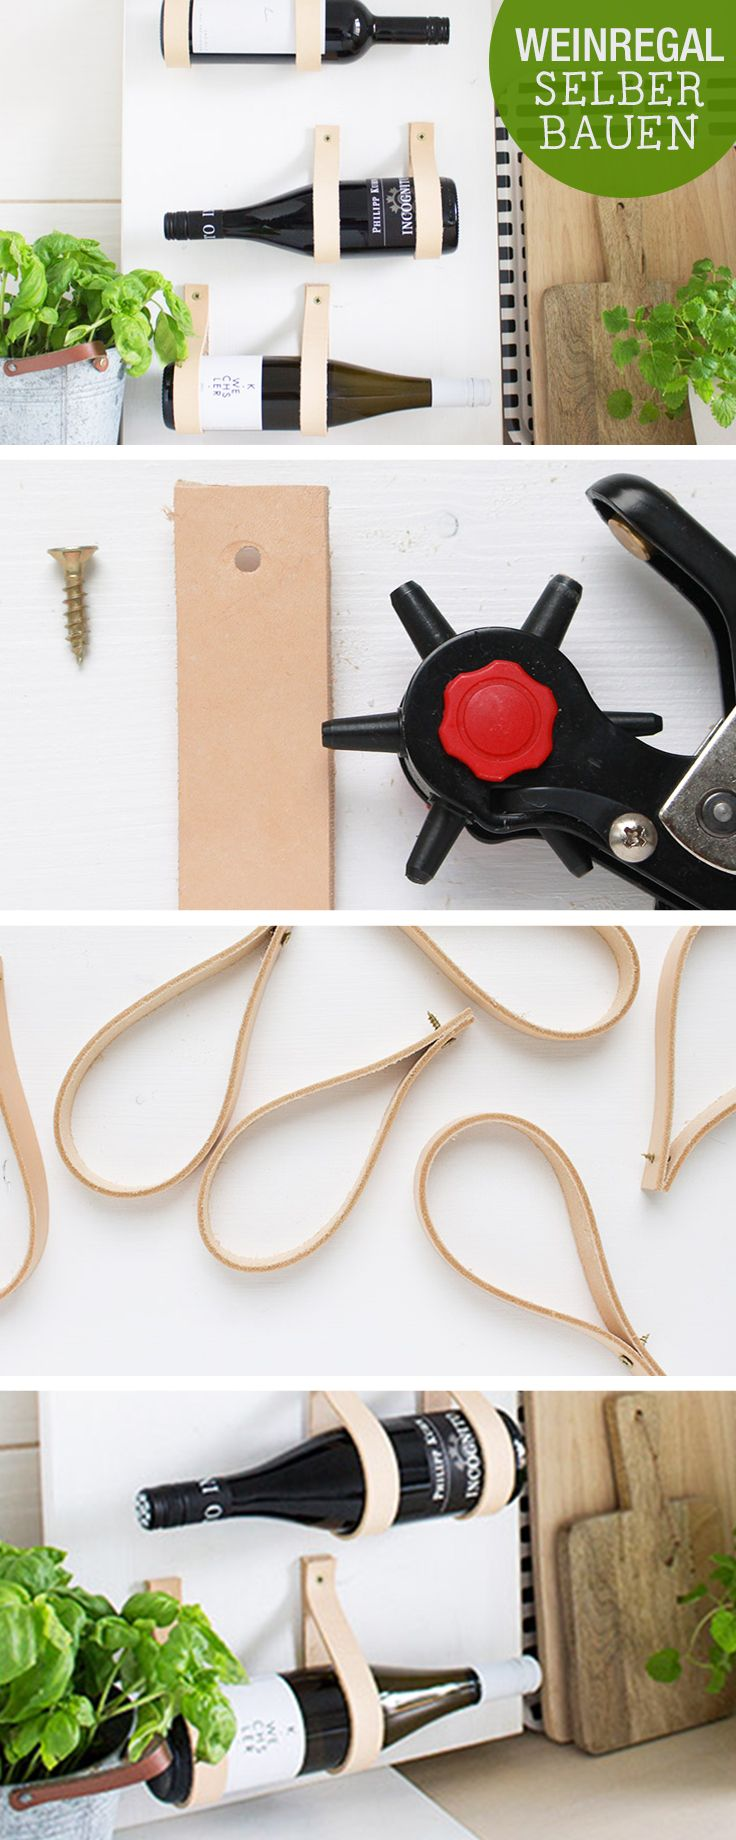 DIY-Anleitung: Weinregal mit Lederbändern selber bauen / diy tutorial: wine rack with leather straps, craft home decor via DaWanda.com